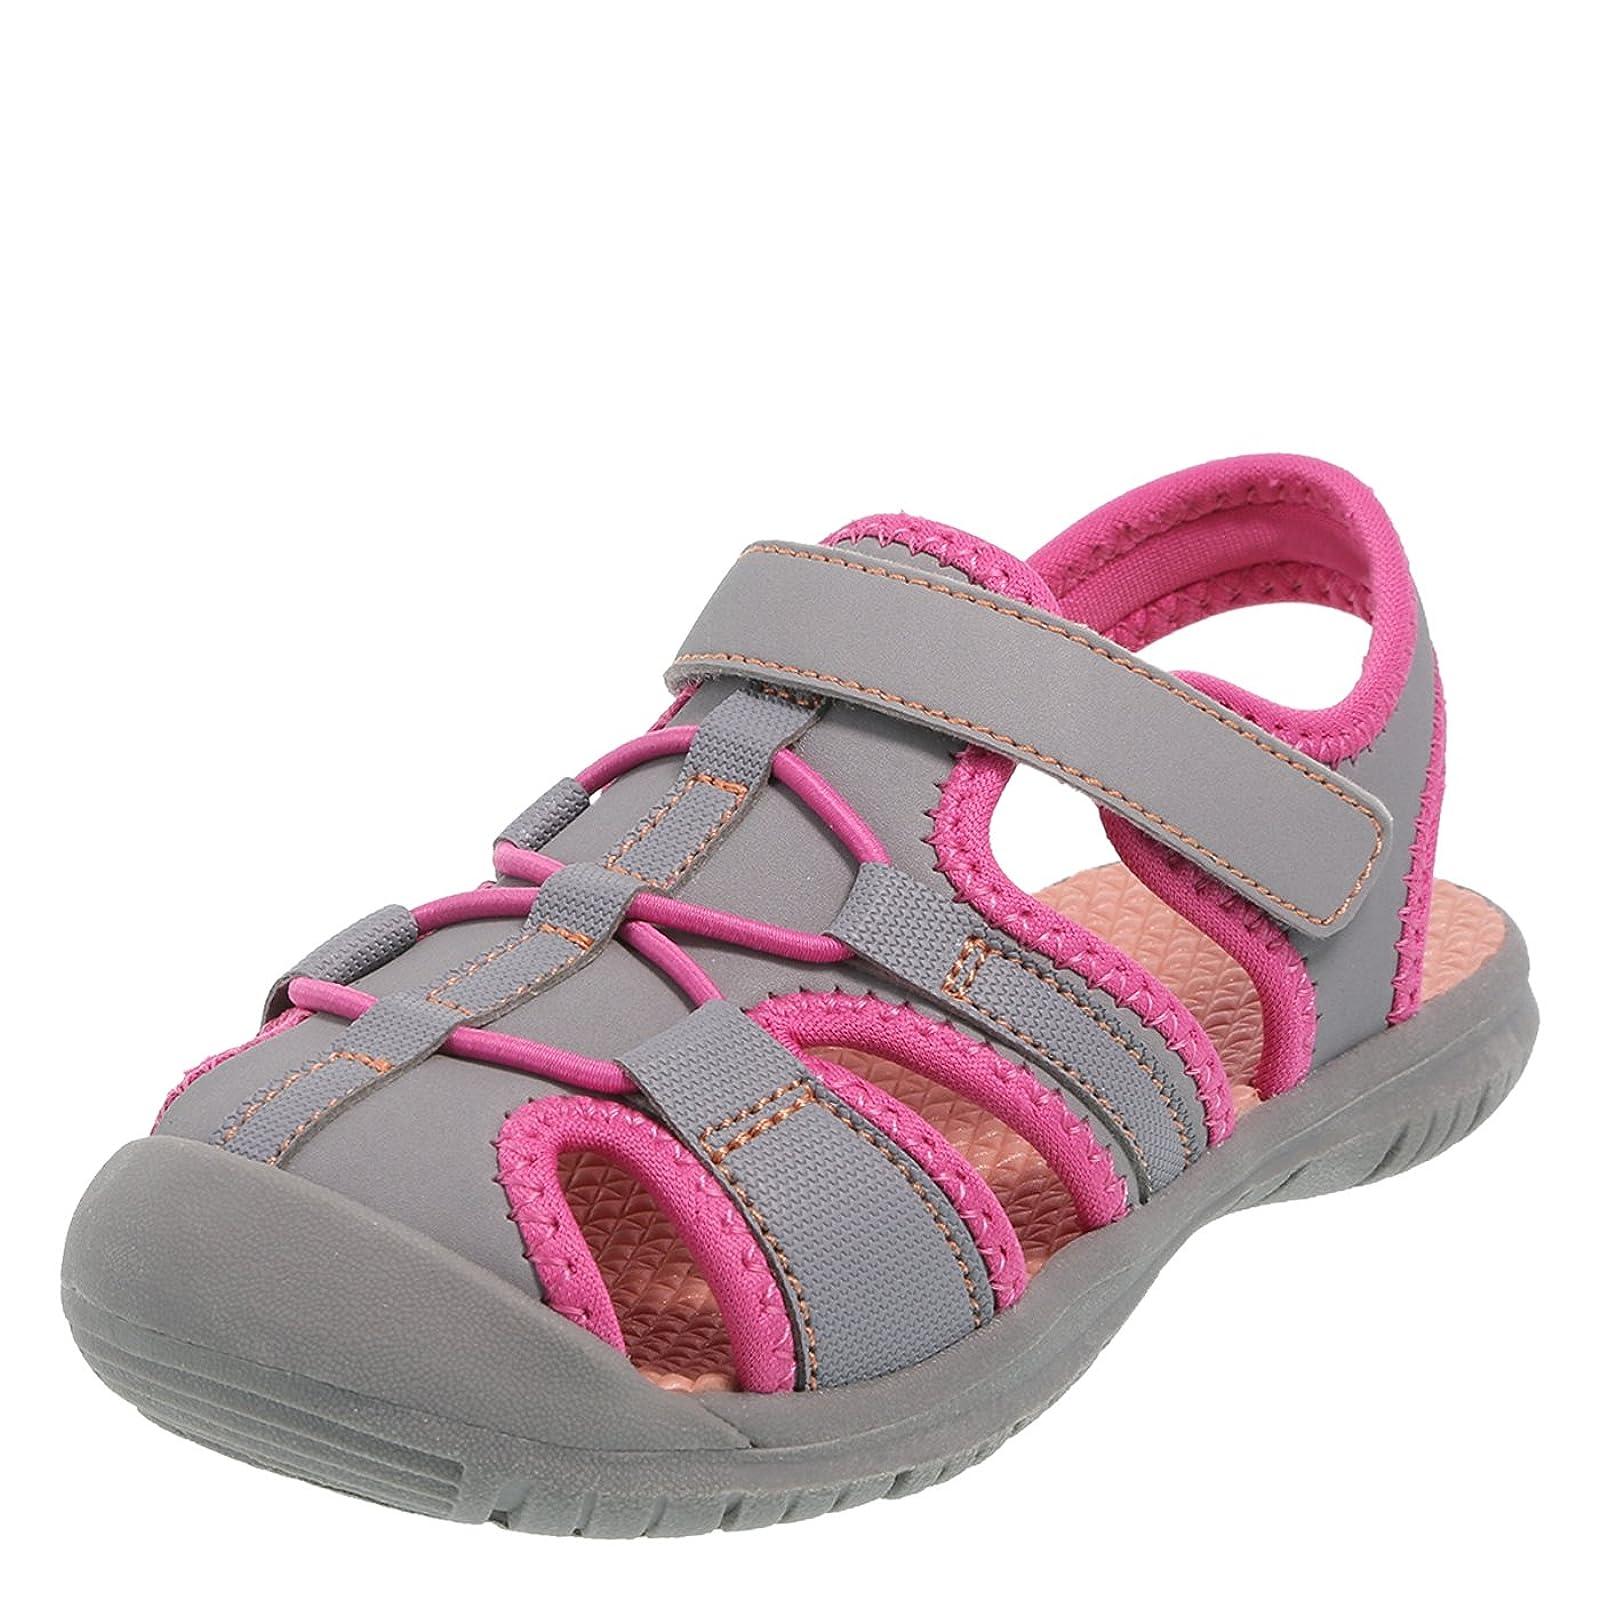 Rugged Outback Girls' Toddler Marina Bumptoe Sandal D(M) Mens - 4